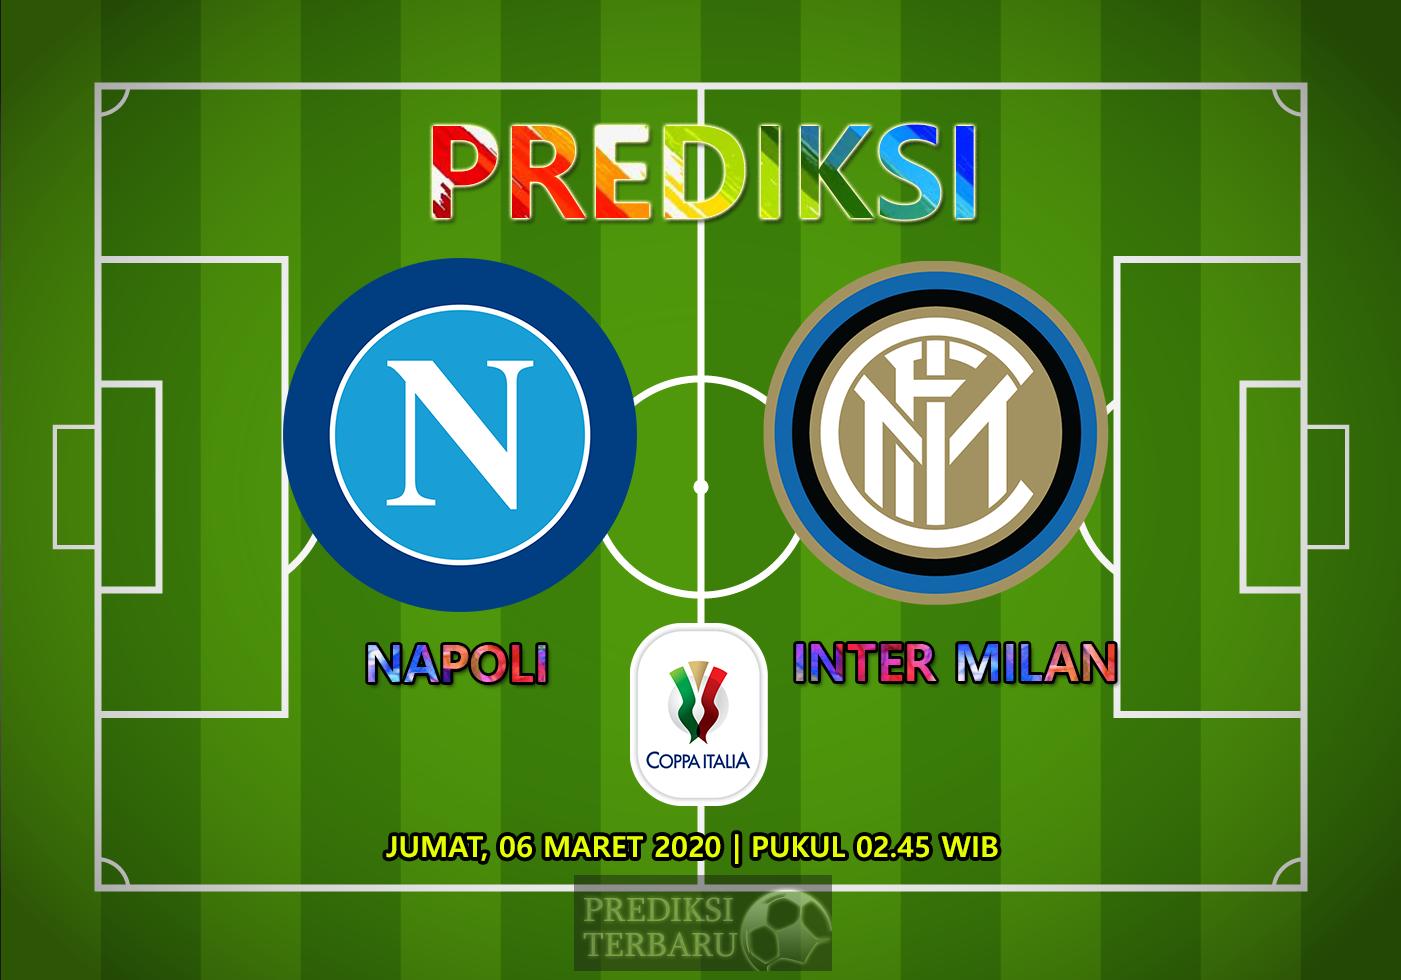 Prediksi Napoli Vs Inter Milan Jumat 06 Maret